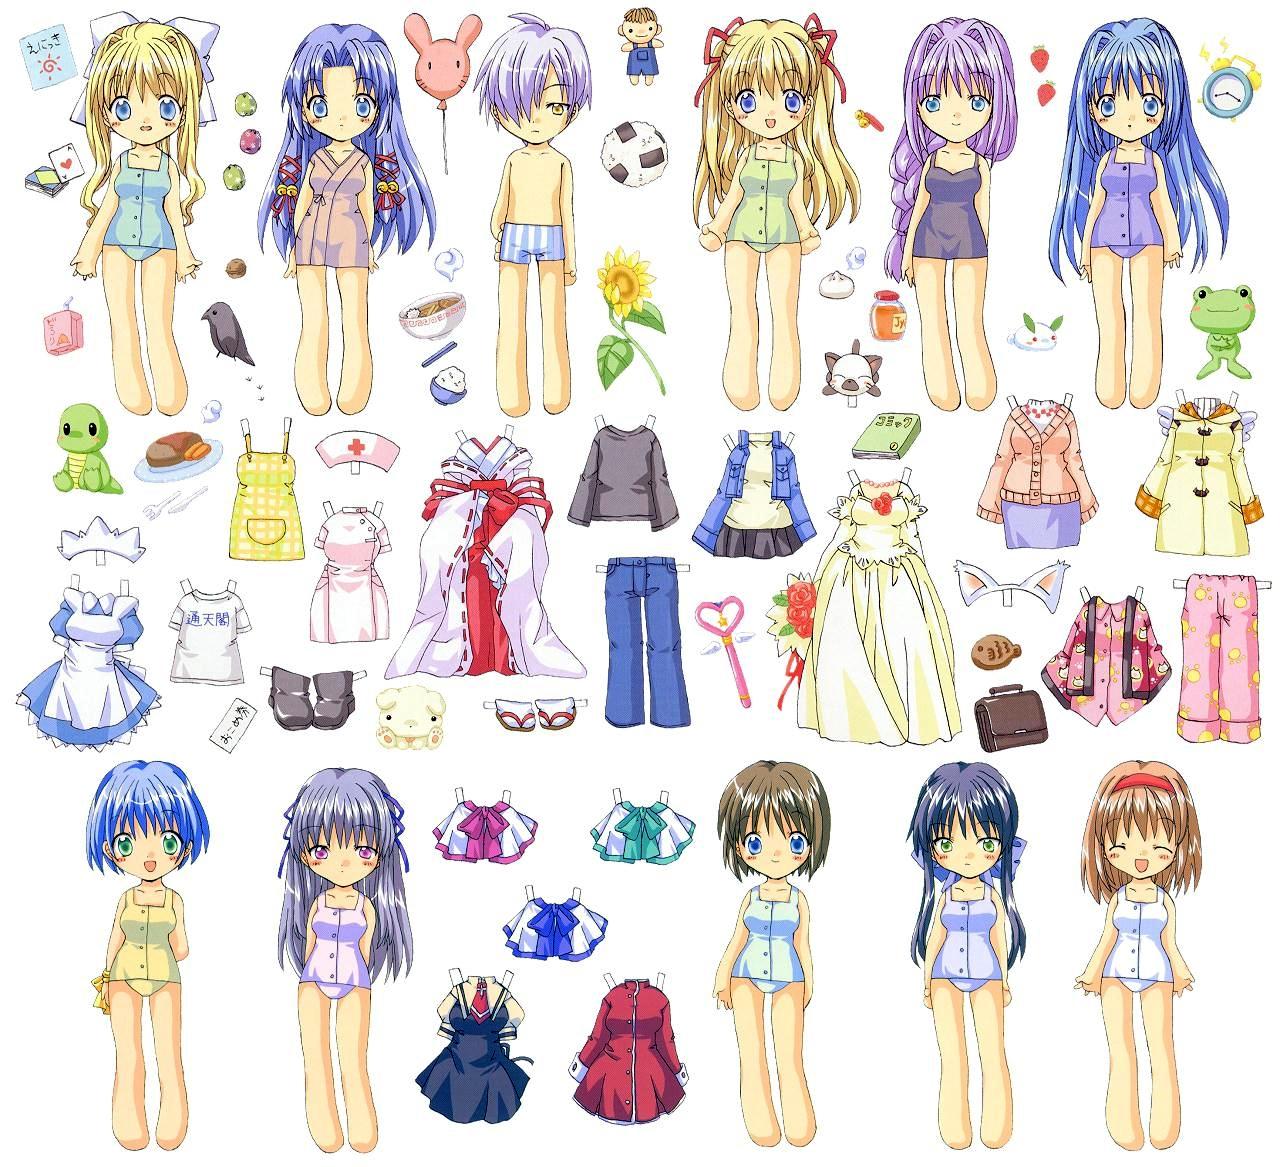 google image result for http3bpblogspotcom qws1d3olj9utmuyf8gp7ciaaaaaaaaihcq0vfywdzoy0s1600 paper2bdollsjpg paper dolls pinterest dolls